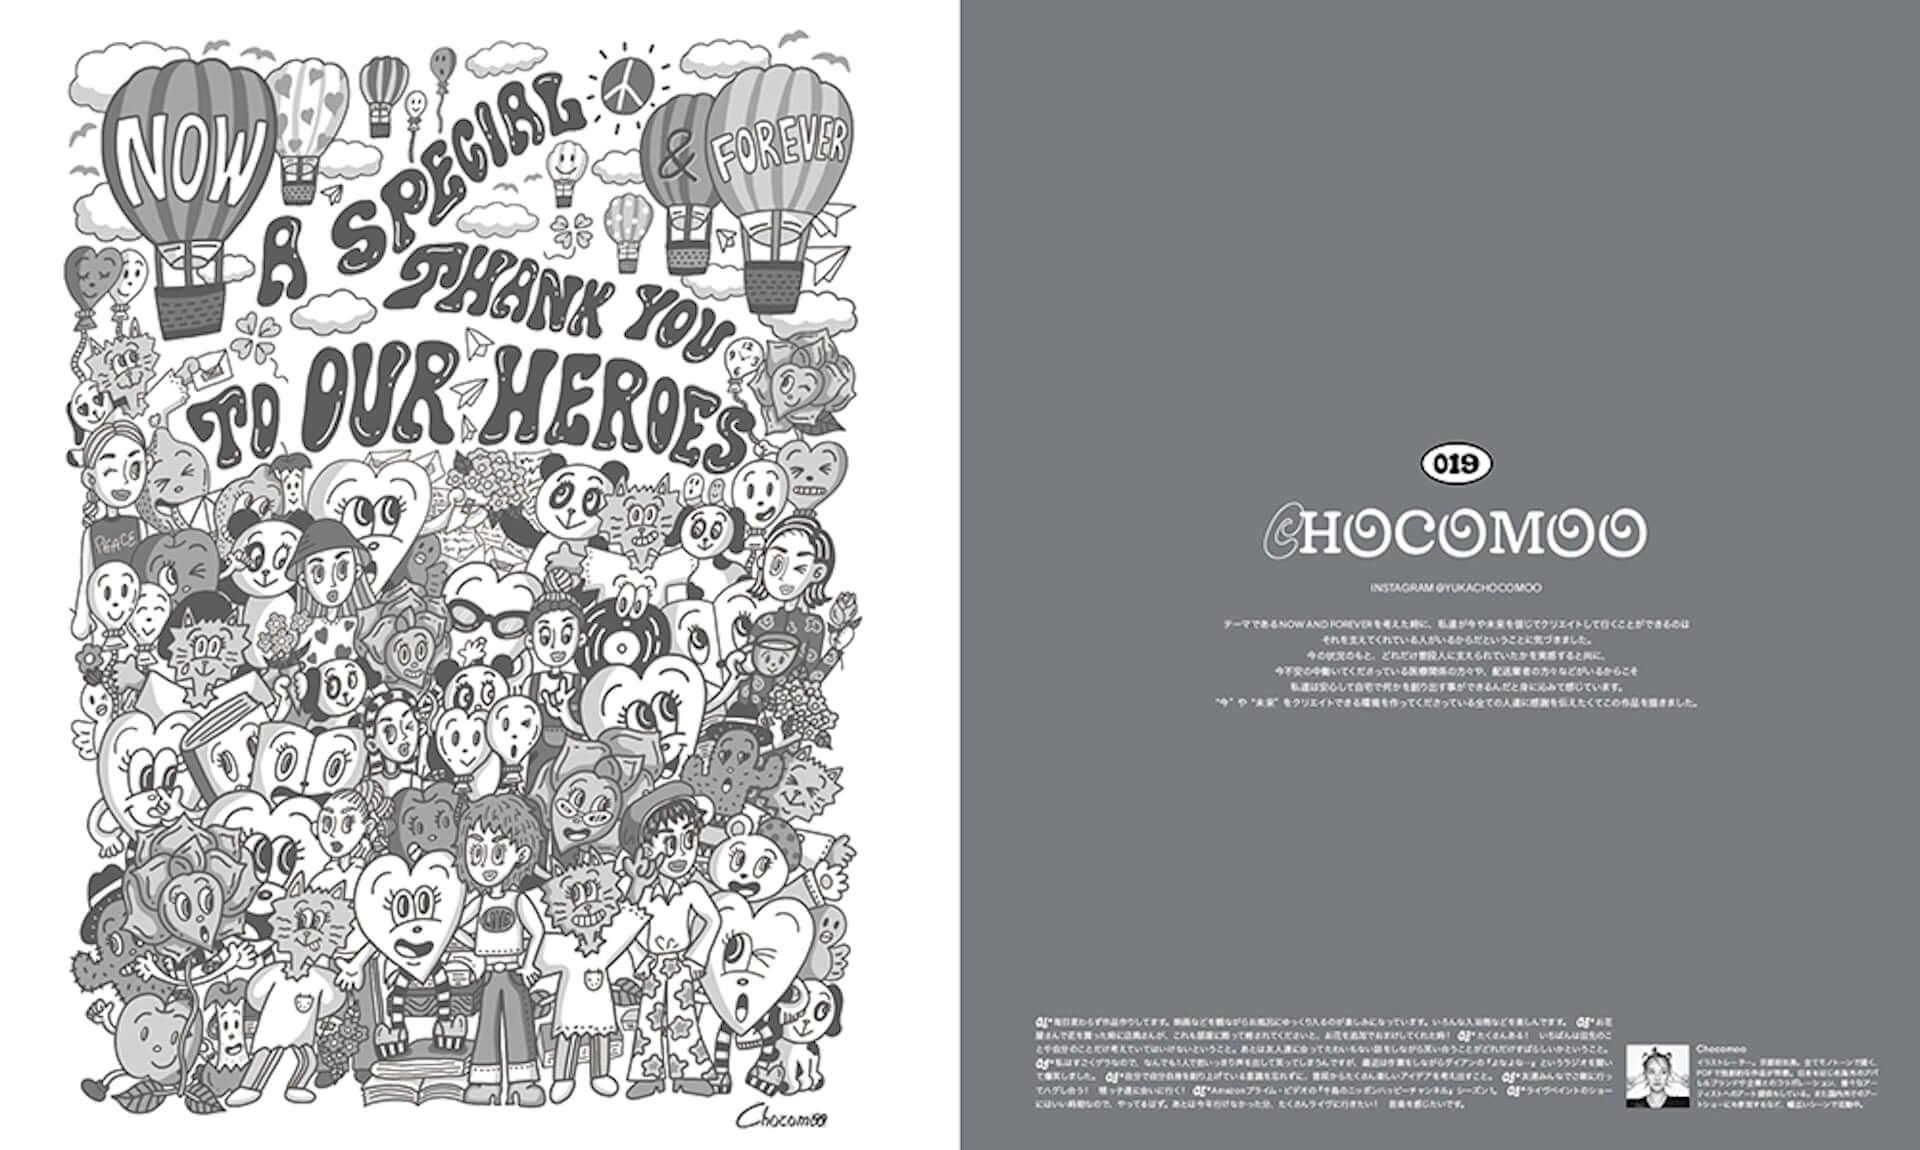 『NYLON JAPAN』初登場の赤西仁と錦戸亮が本音を語る!1万字インタビューやスペシャルな特集が組まれた最新号が発売 lf200522_nylon_02-1920x1150